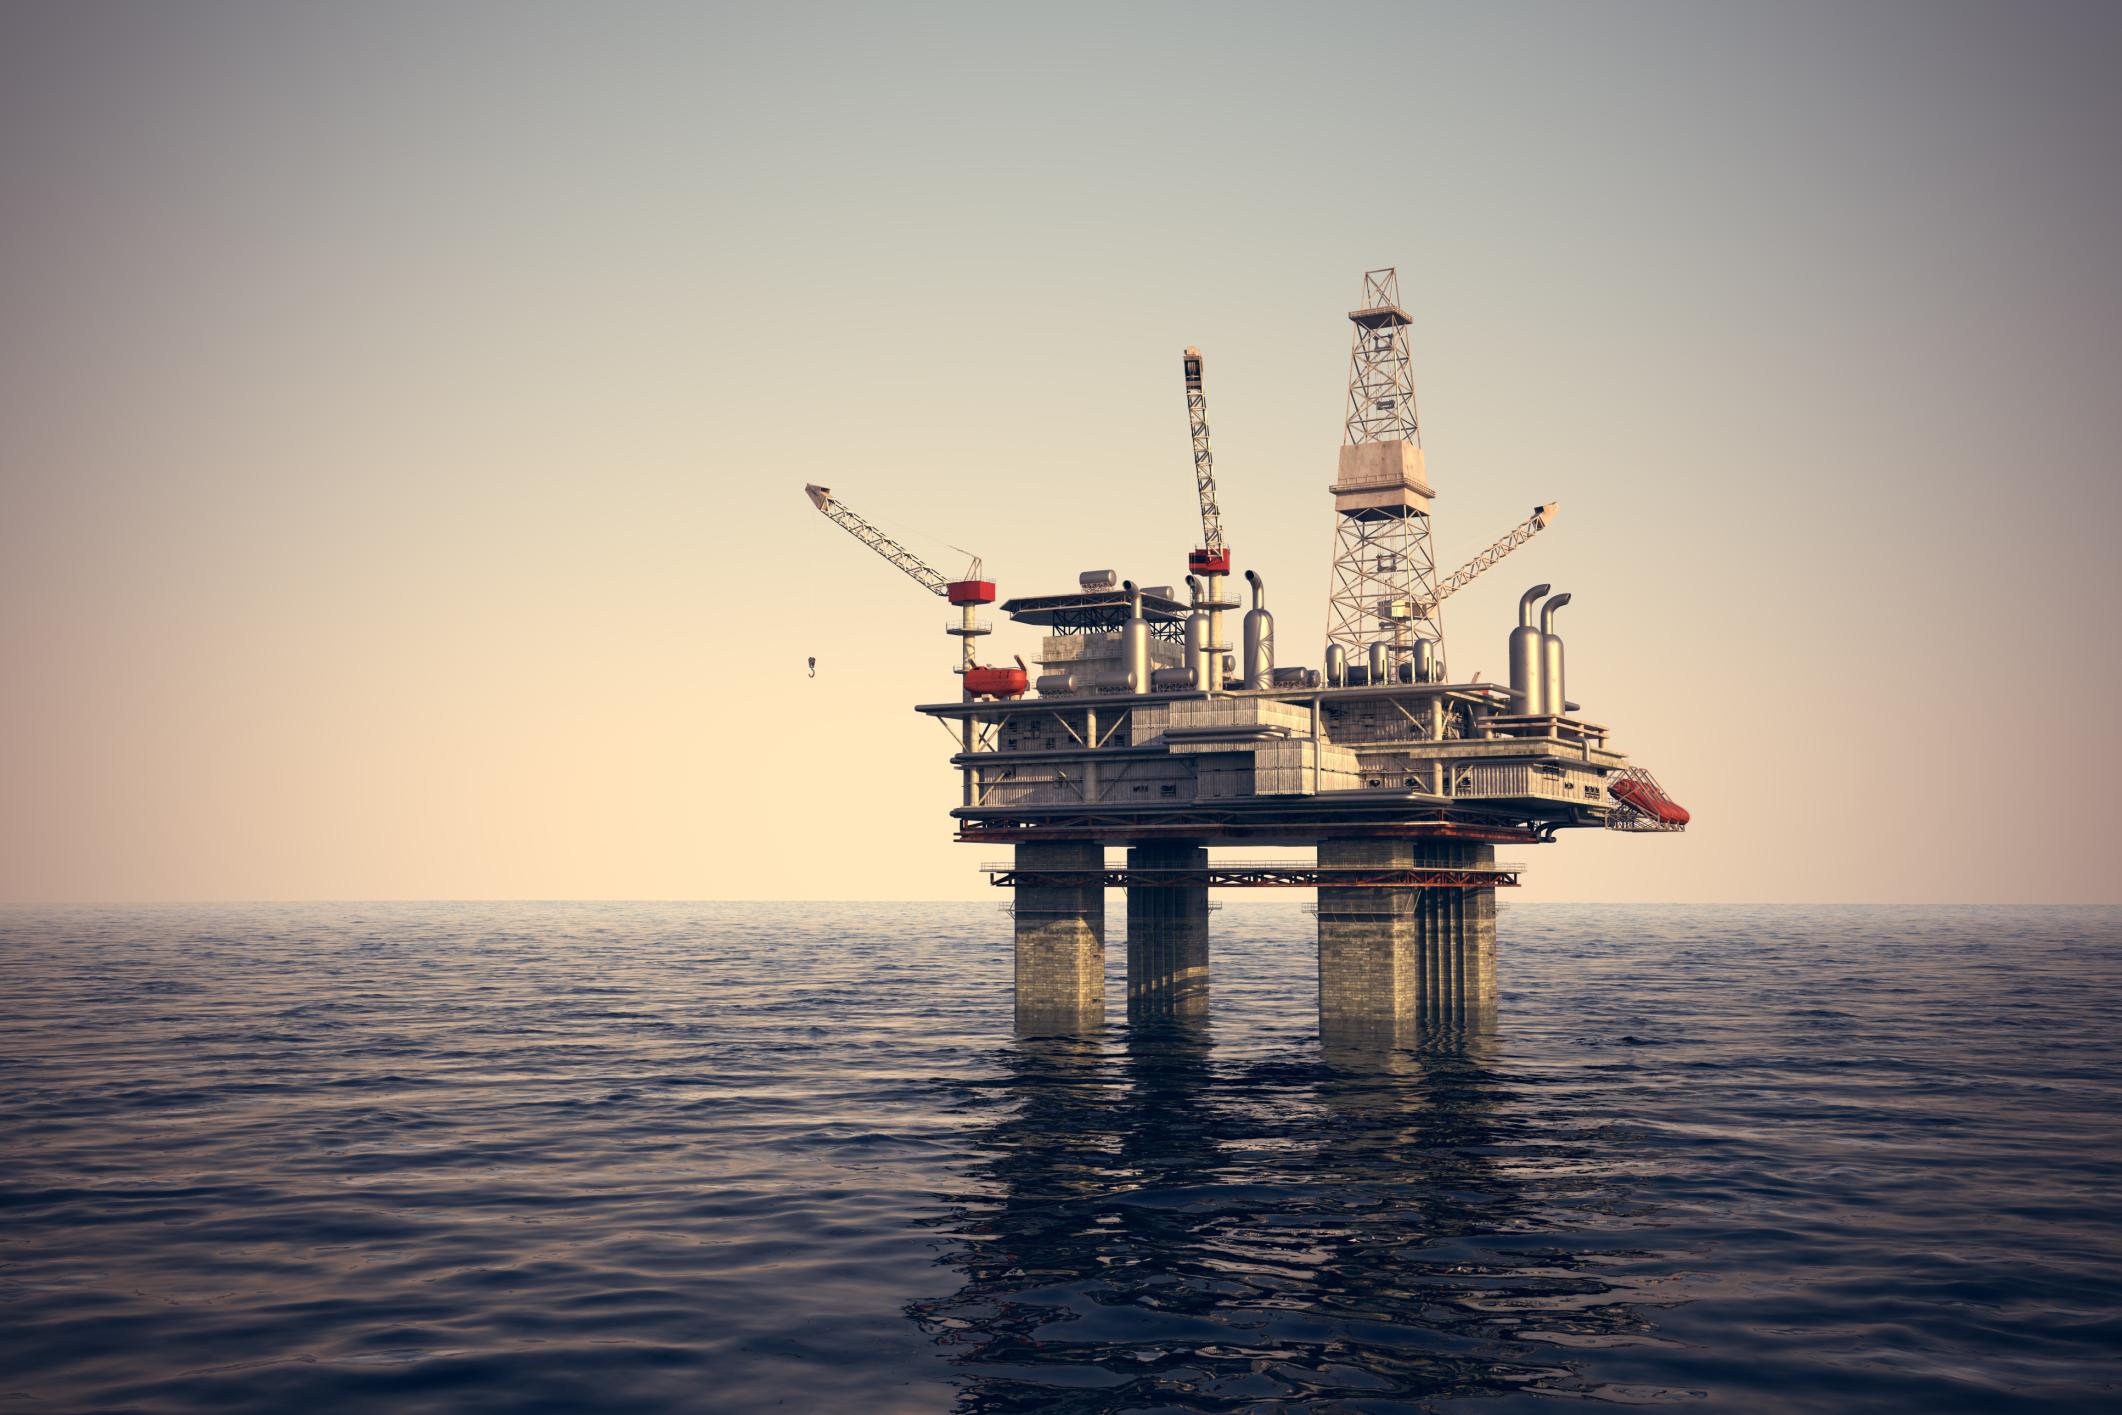 Unconventional Oil Exploration, Part 3: Ultra-deepwater Oil